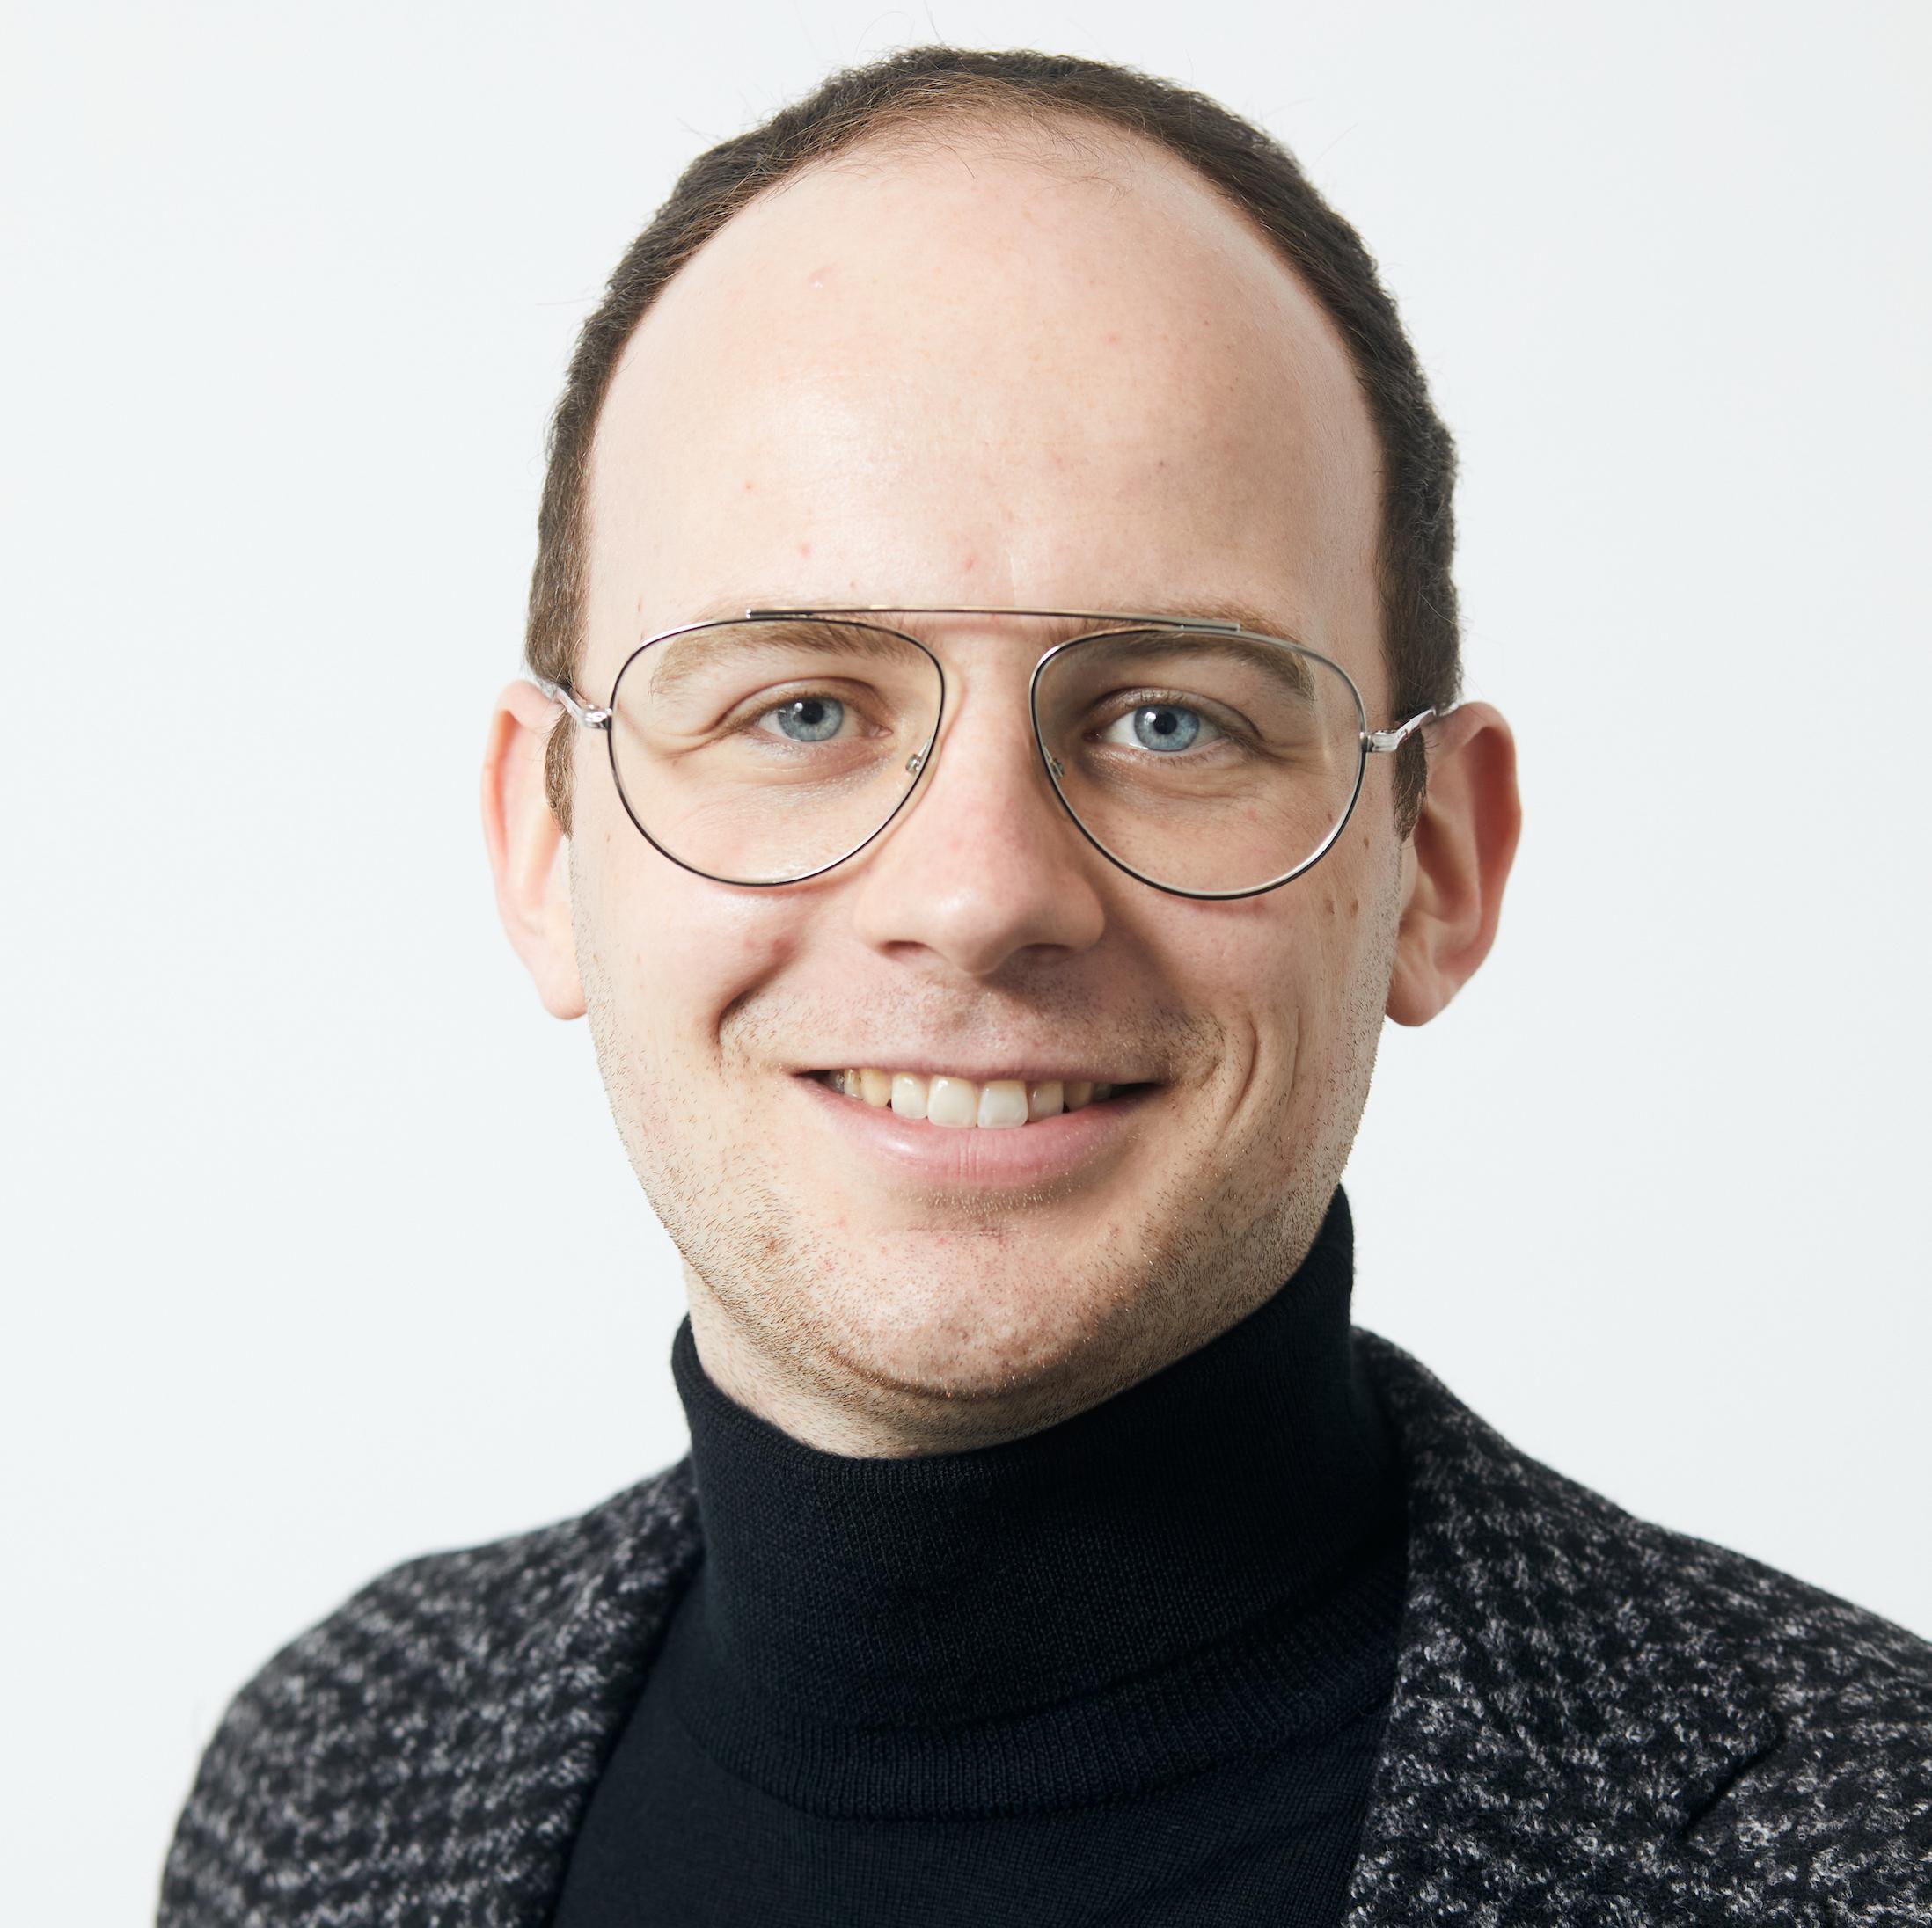 Gesichter Marius Grieseler